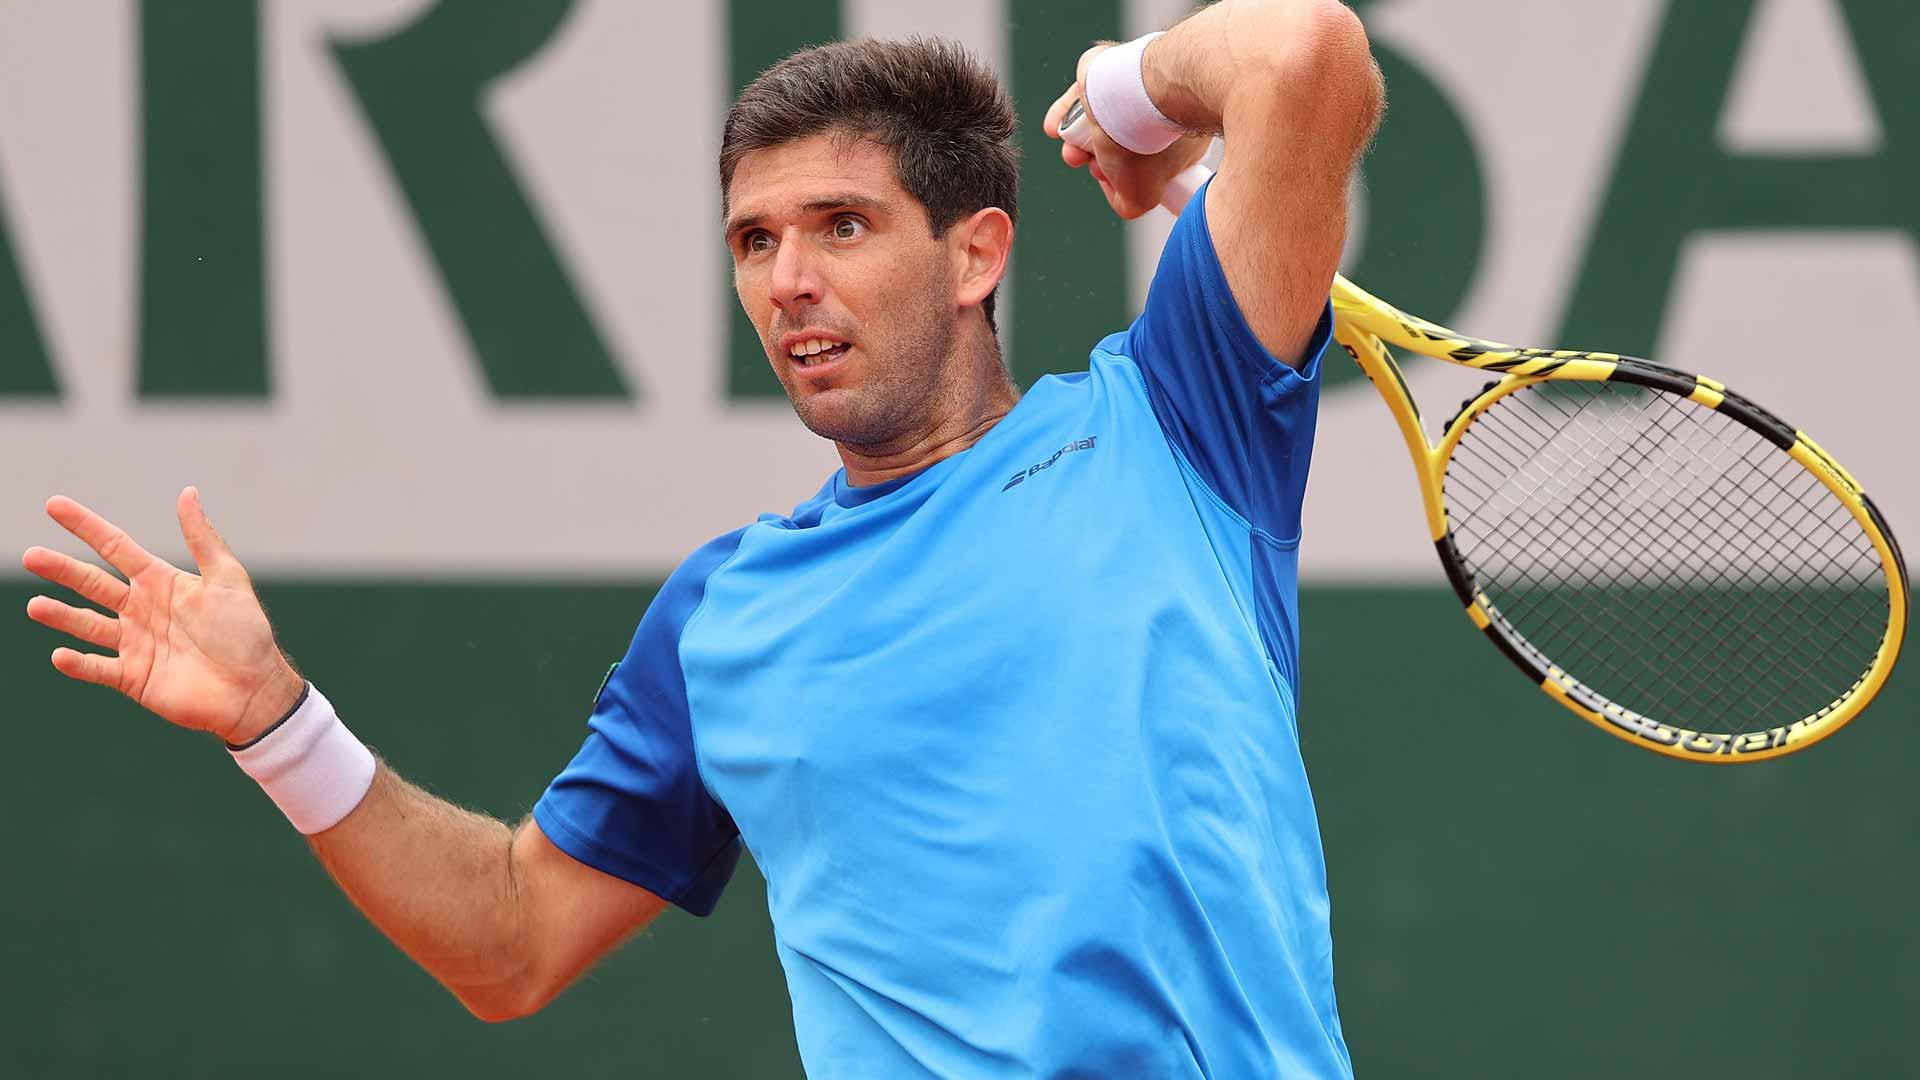 Winston-Salem Open 2021: Federico Delbonis vs. Marcos Giron Tennis Pick and Prediction